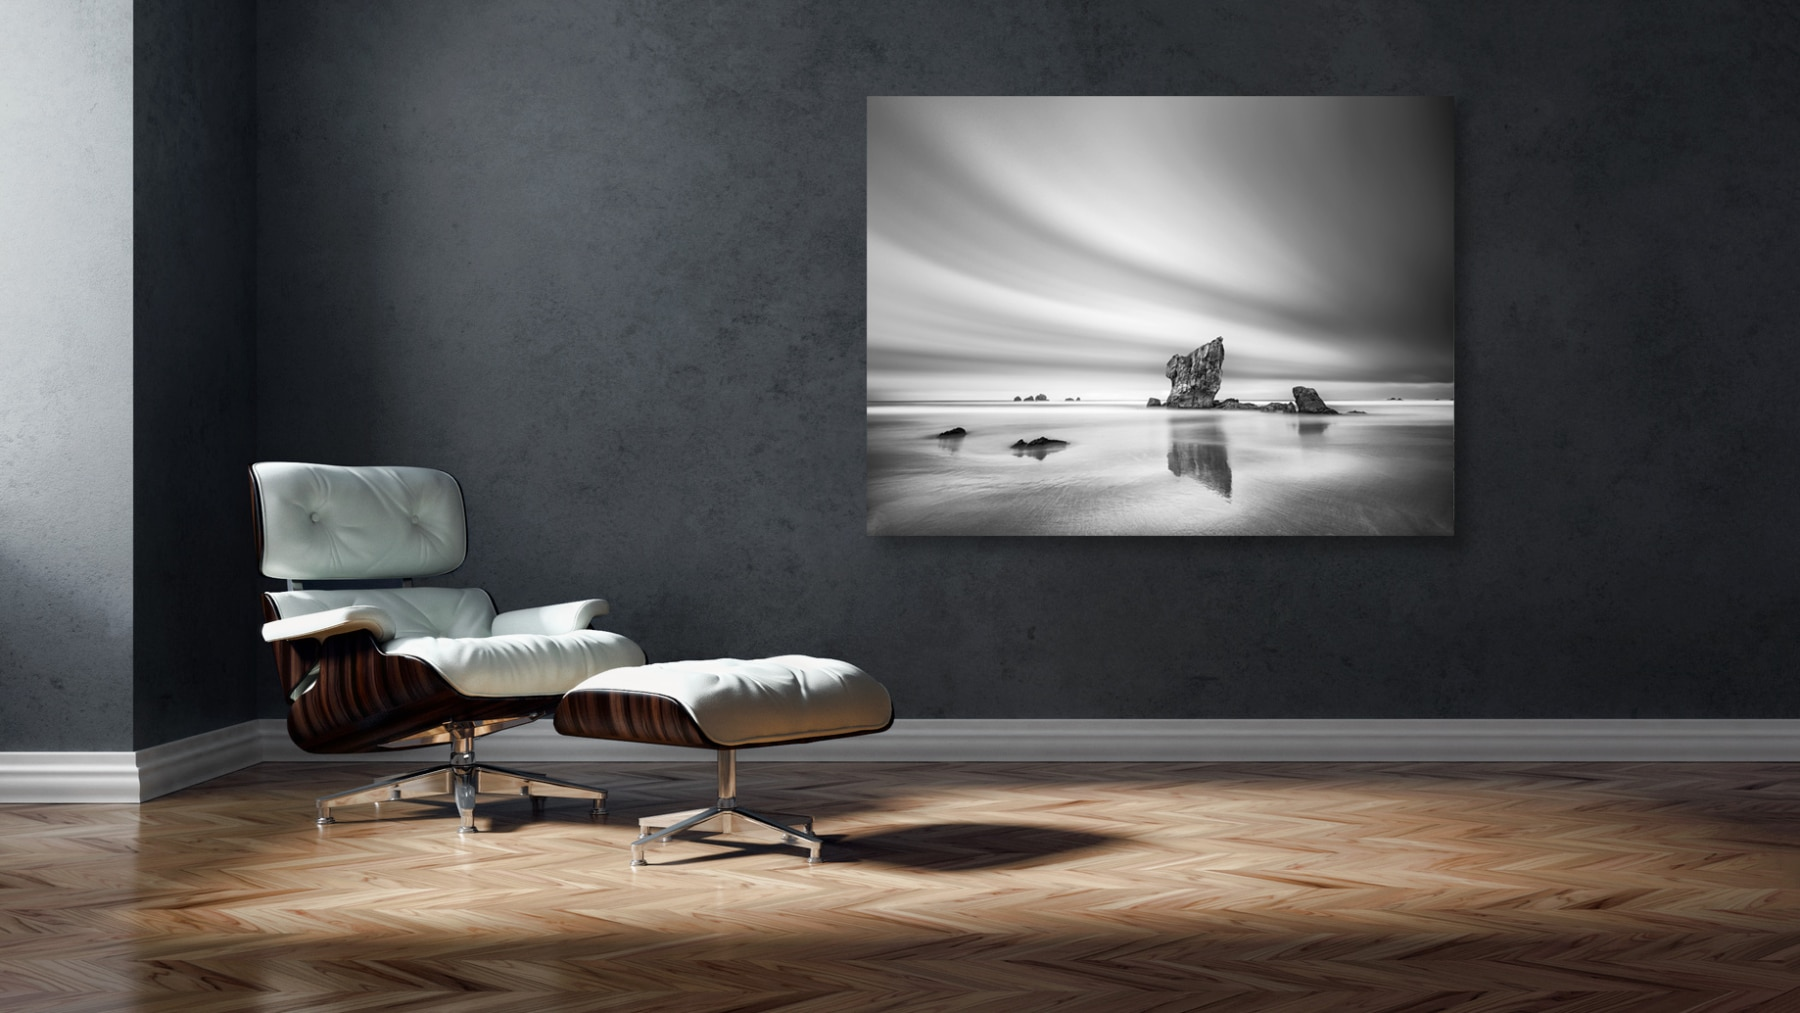 Spain, Asturias Black and White Study I © by Gerry Pacher